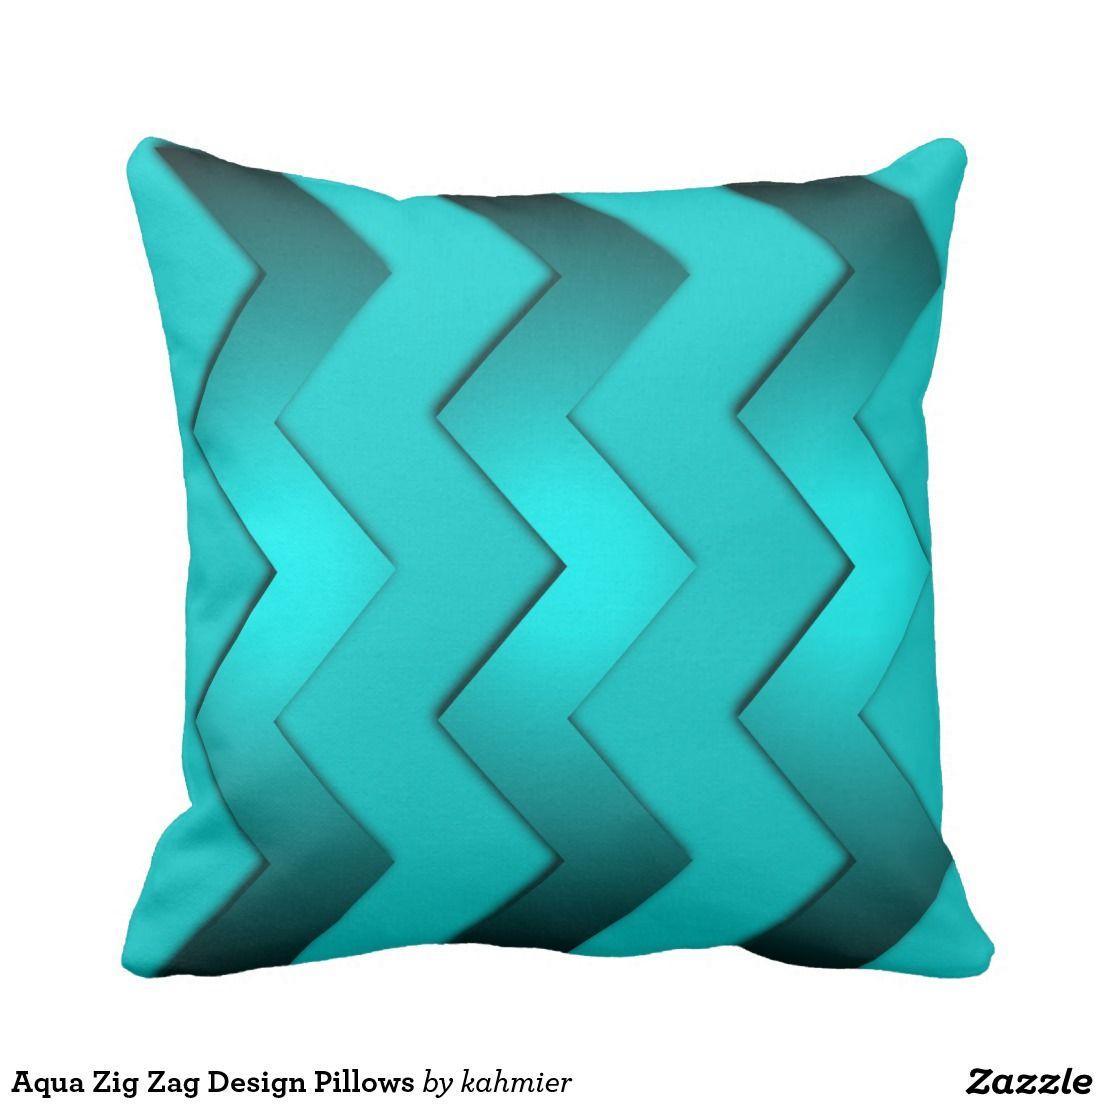 Aqua Zig Zag Design Pillows 40% off with code CYBRWEEKSALE